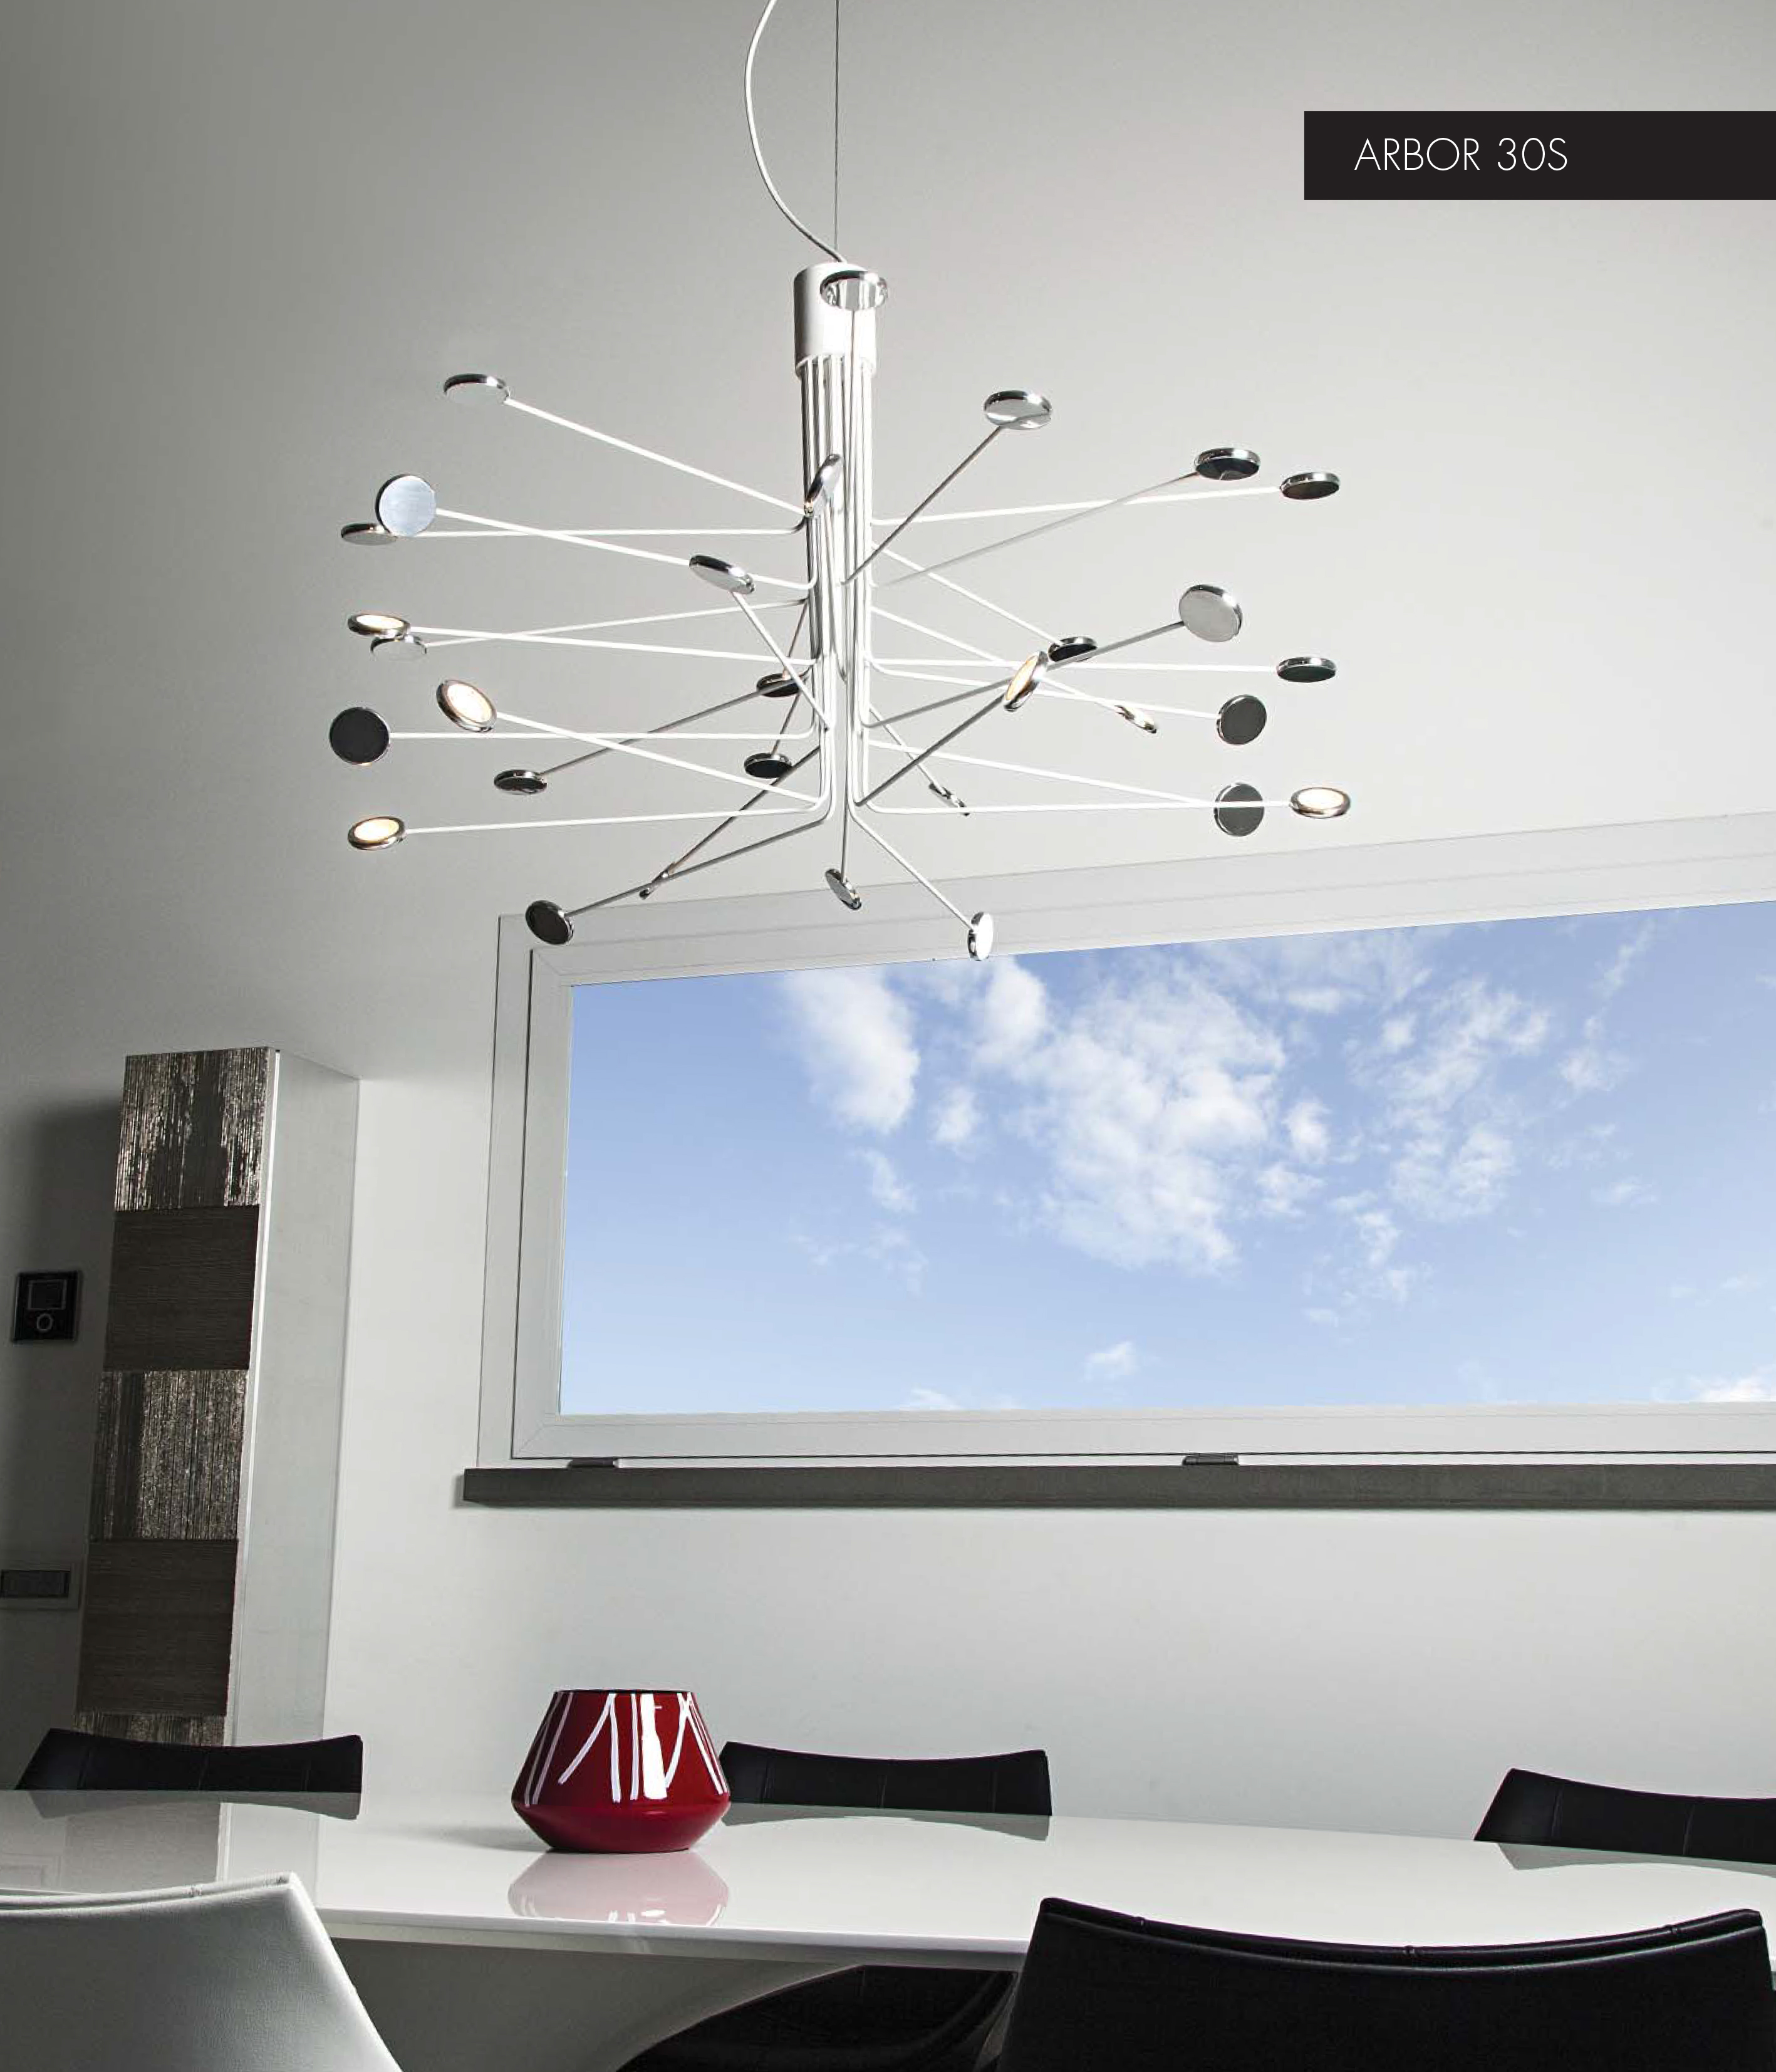 luminaire fait maison good luminaire fait maison with luminaire fait maison tags ampoule led. Black Bedroom Furniture Sets. Home Design Ideas